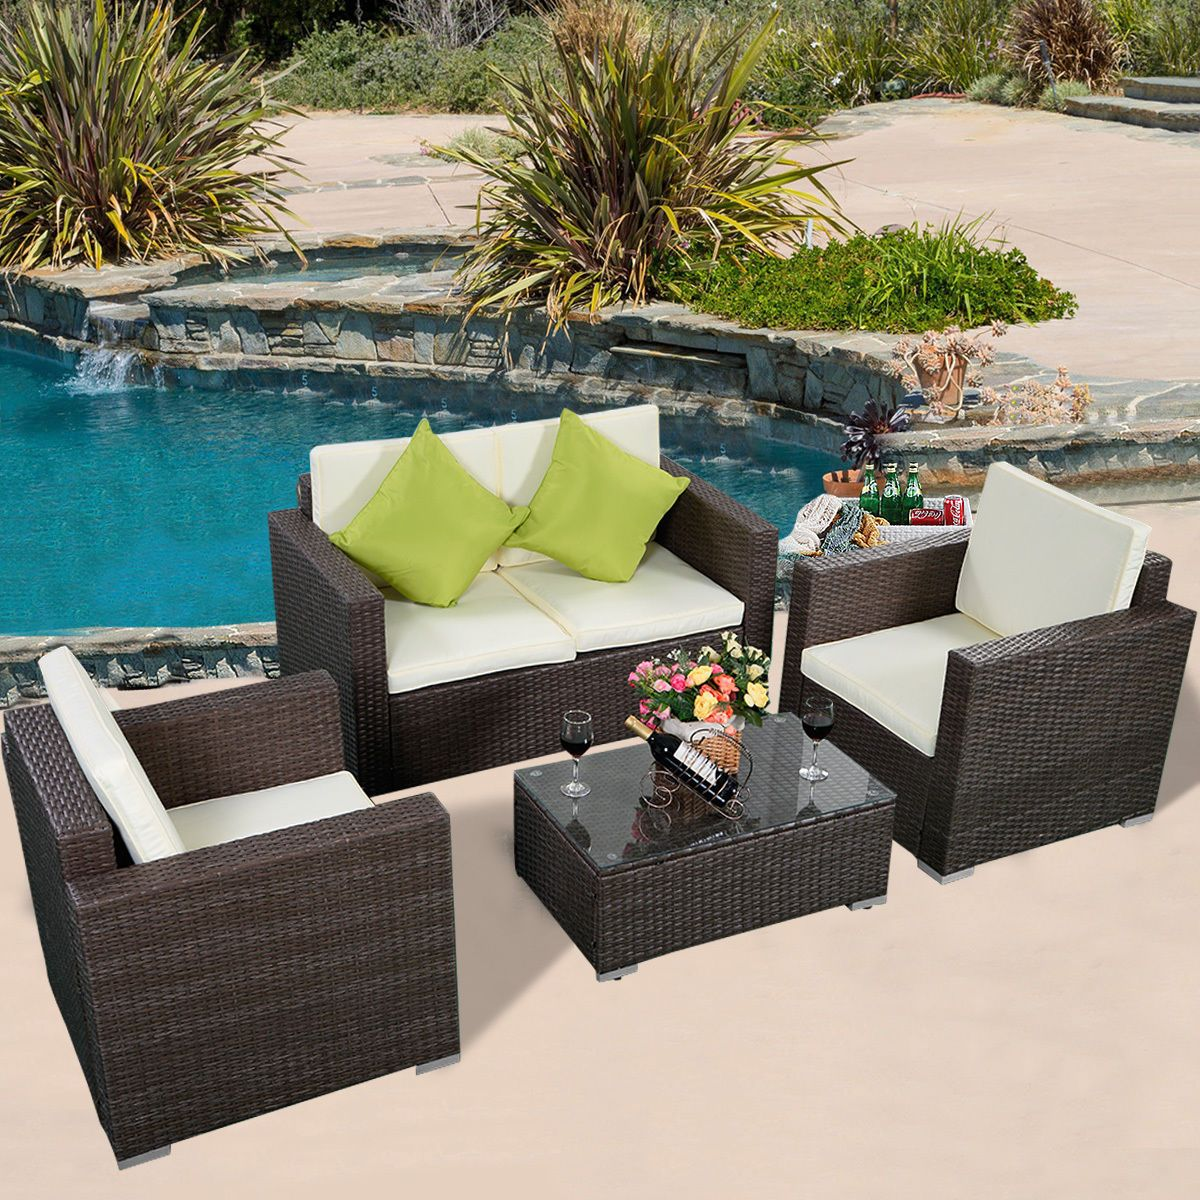 4pc Brown Wicker Rattan Sofa Furniture Set Patio Garden Lawn